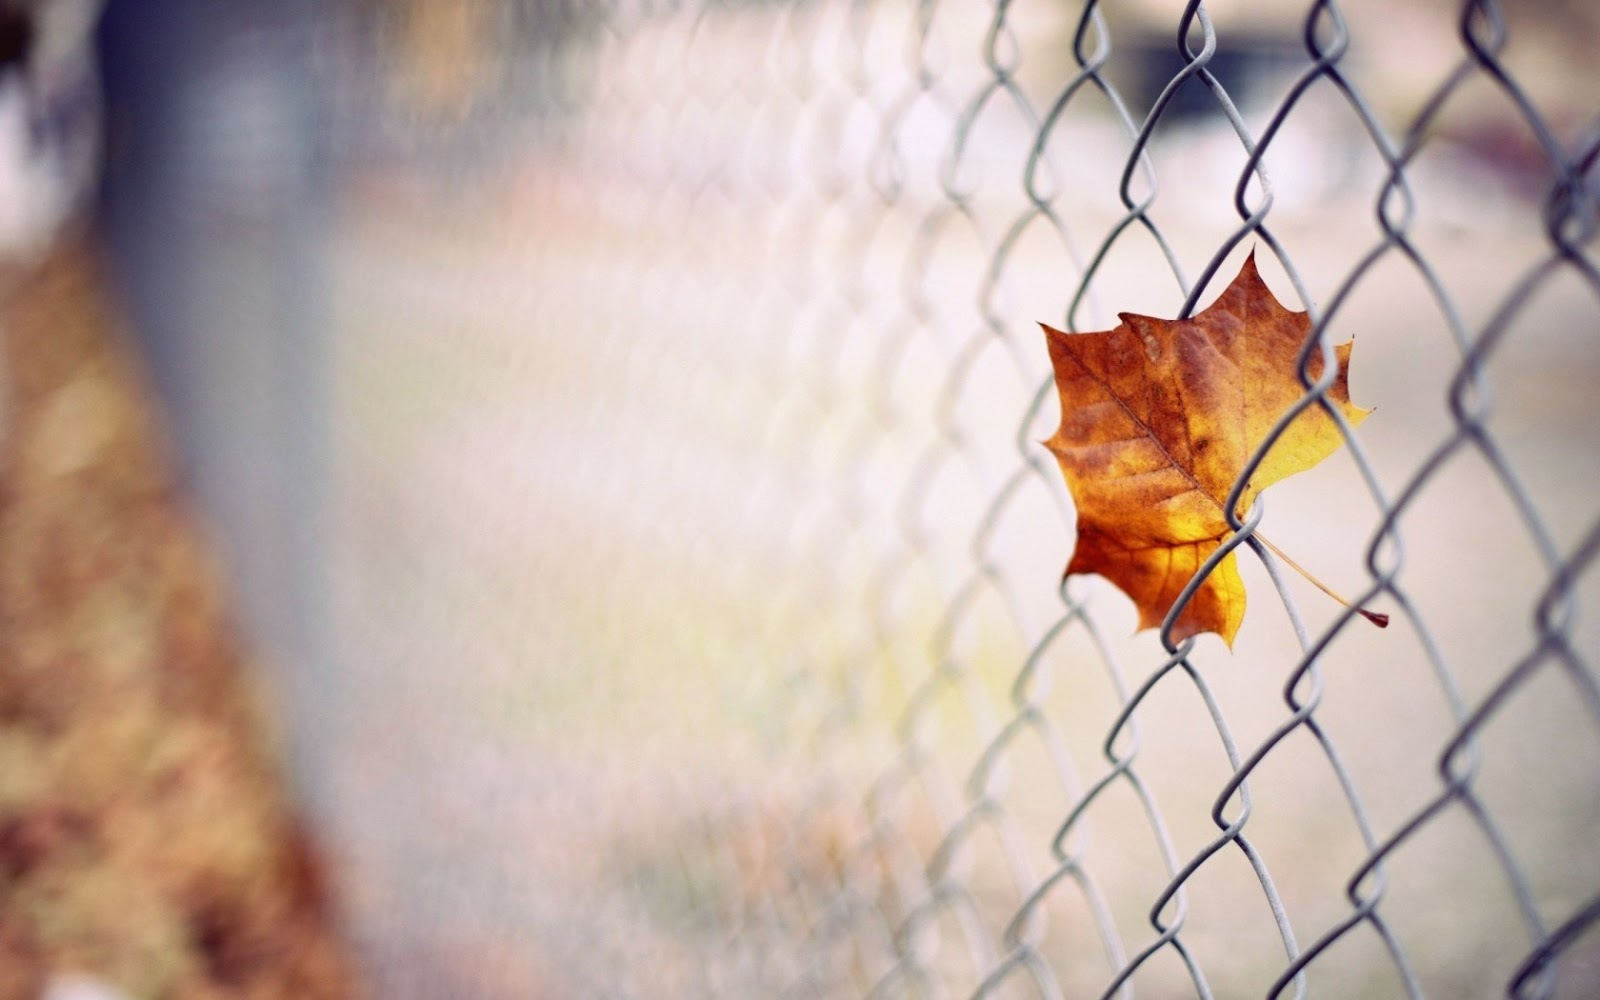 Free Desktop Wallpaper Fall Foliage صور خلفيات أوراق الشجر جميلة عالية الدقة مداد الجليد